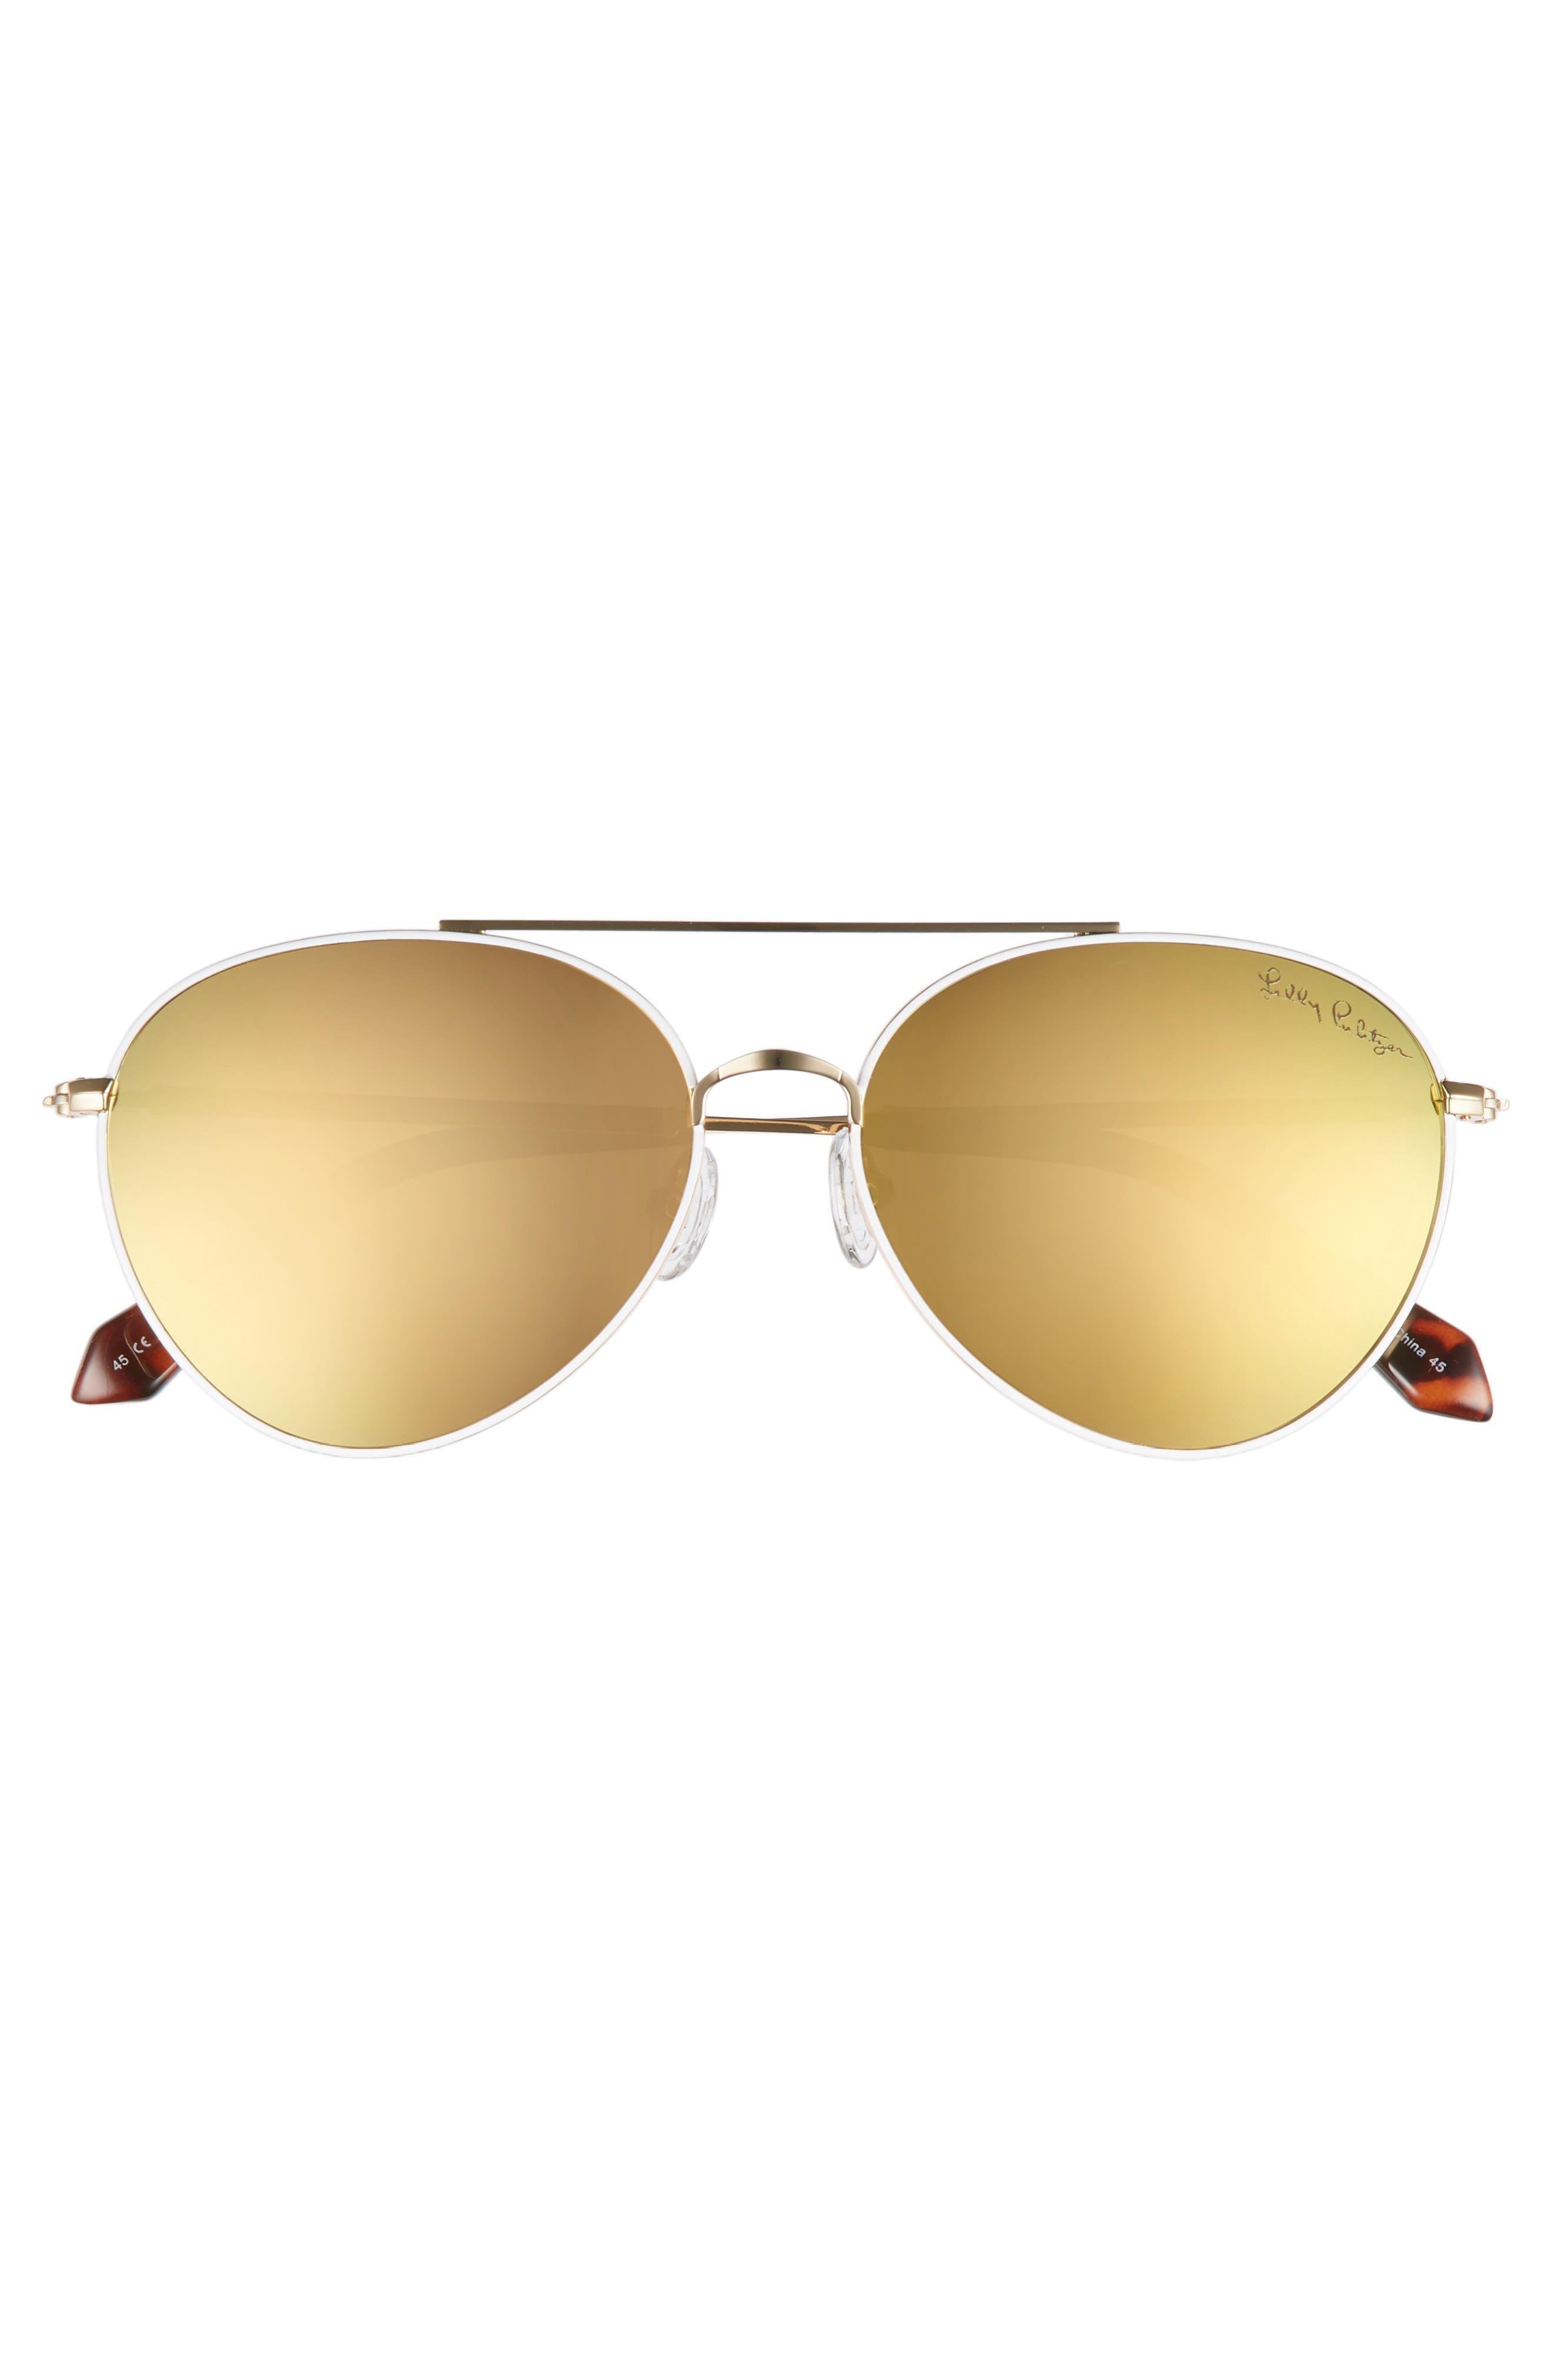 Isabelle 56mm Polarized Metal Aviator Sunglasses,                             Alternate thumbnail 3, color,                             GOLD/ GOLD